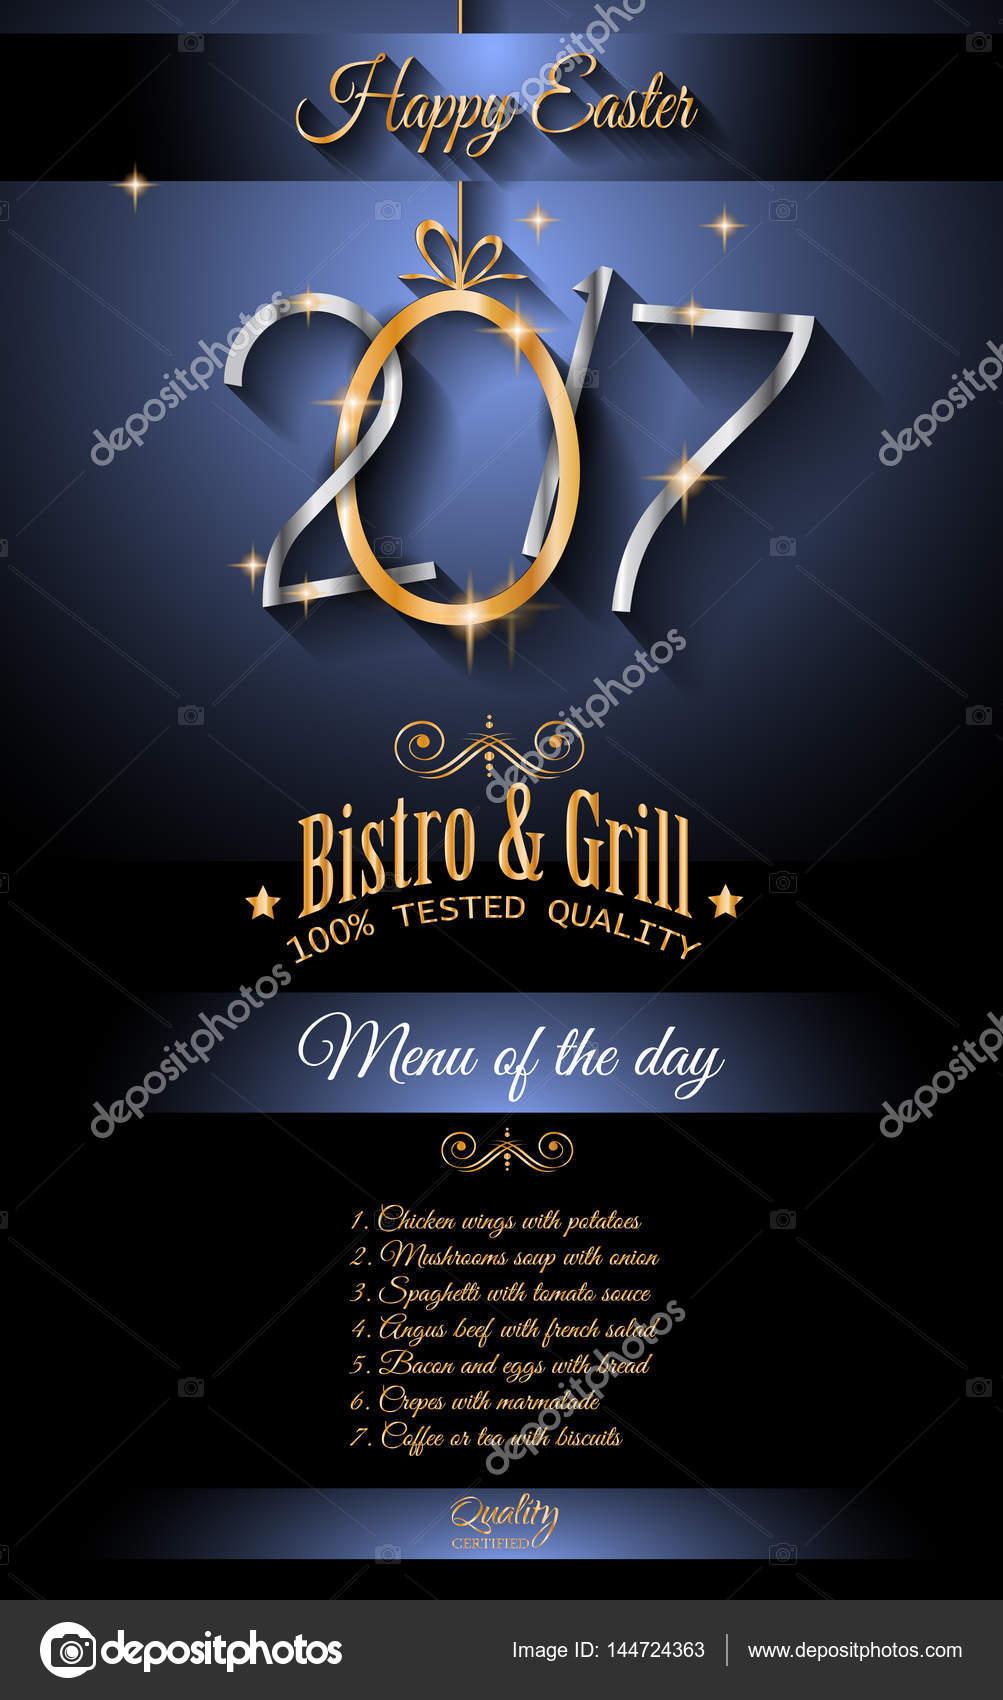 Frohe Ostern Restaurant Menüvorlage — Stockvektor © DavidArts #144724363